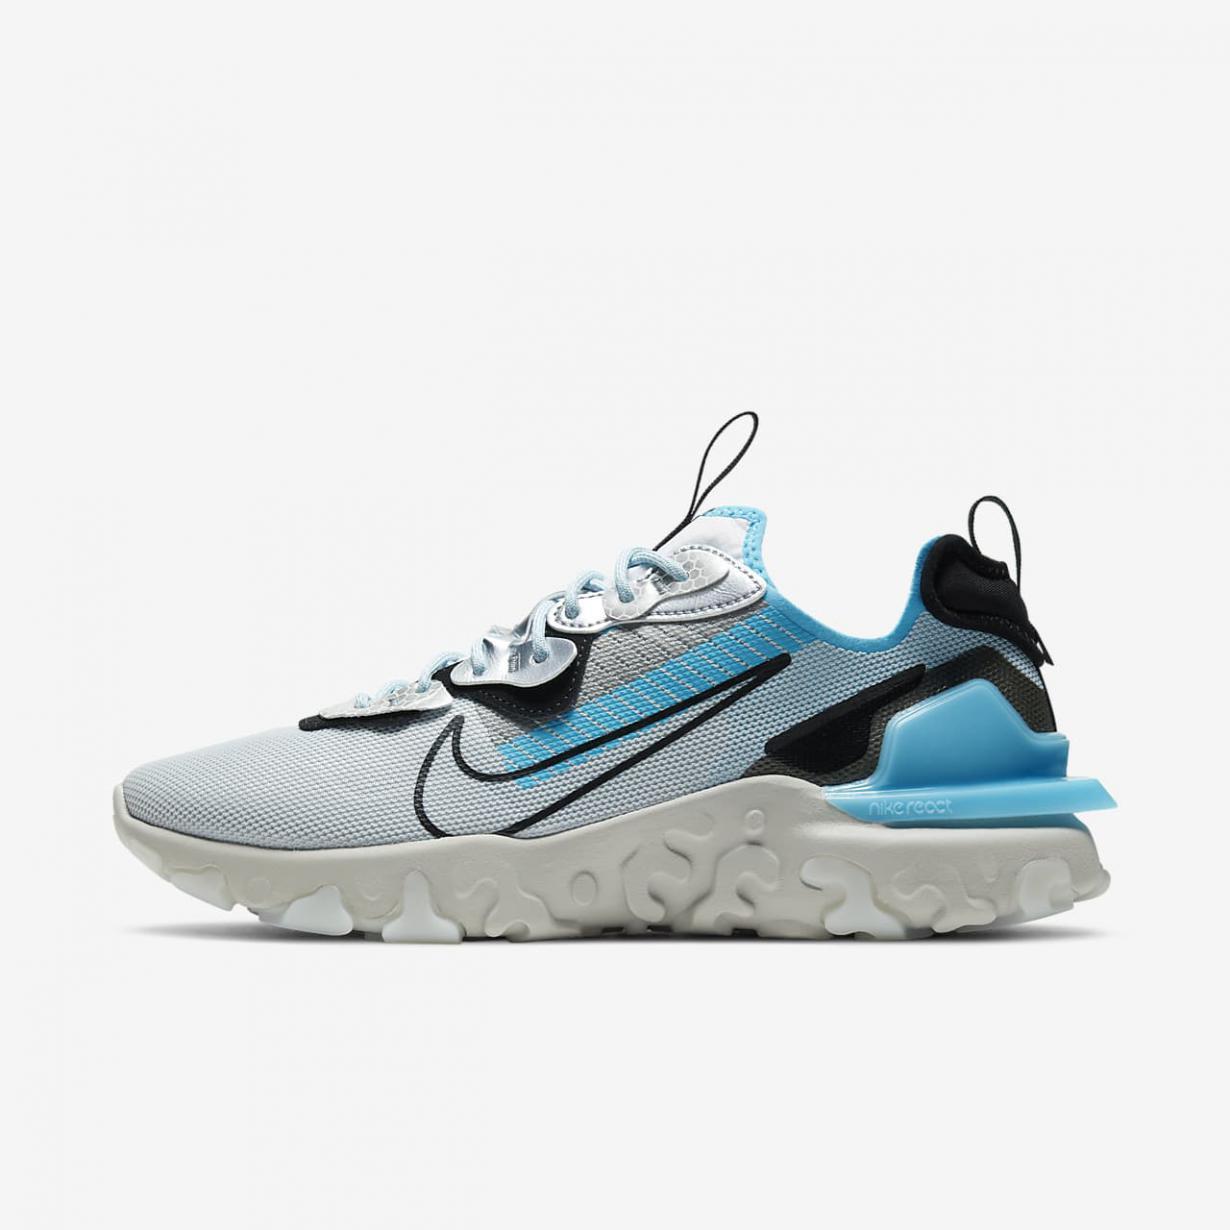 Lifestyle Homme | React Vision PRM 3M™ Platine pur/Noir/Blanc/Bleu Baltique | Nike < Gooddaytricities